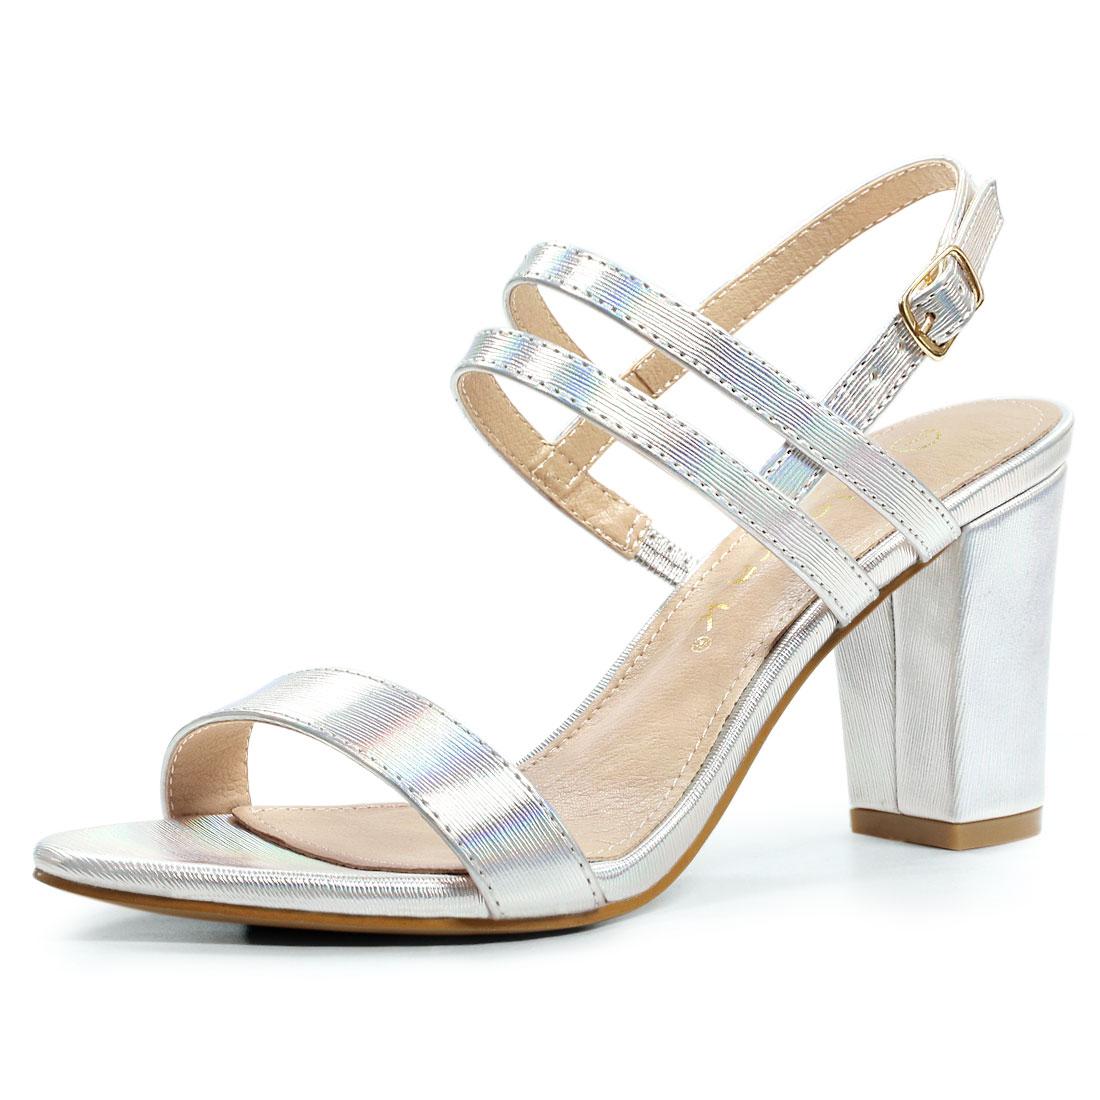 Allegra K Women's Slingback Block Heel Ankle Strap Sandals Silver US 9.5